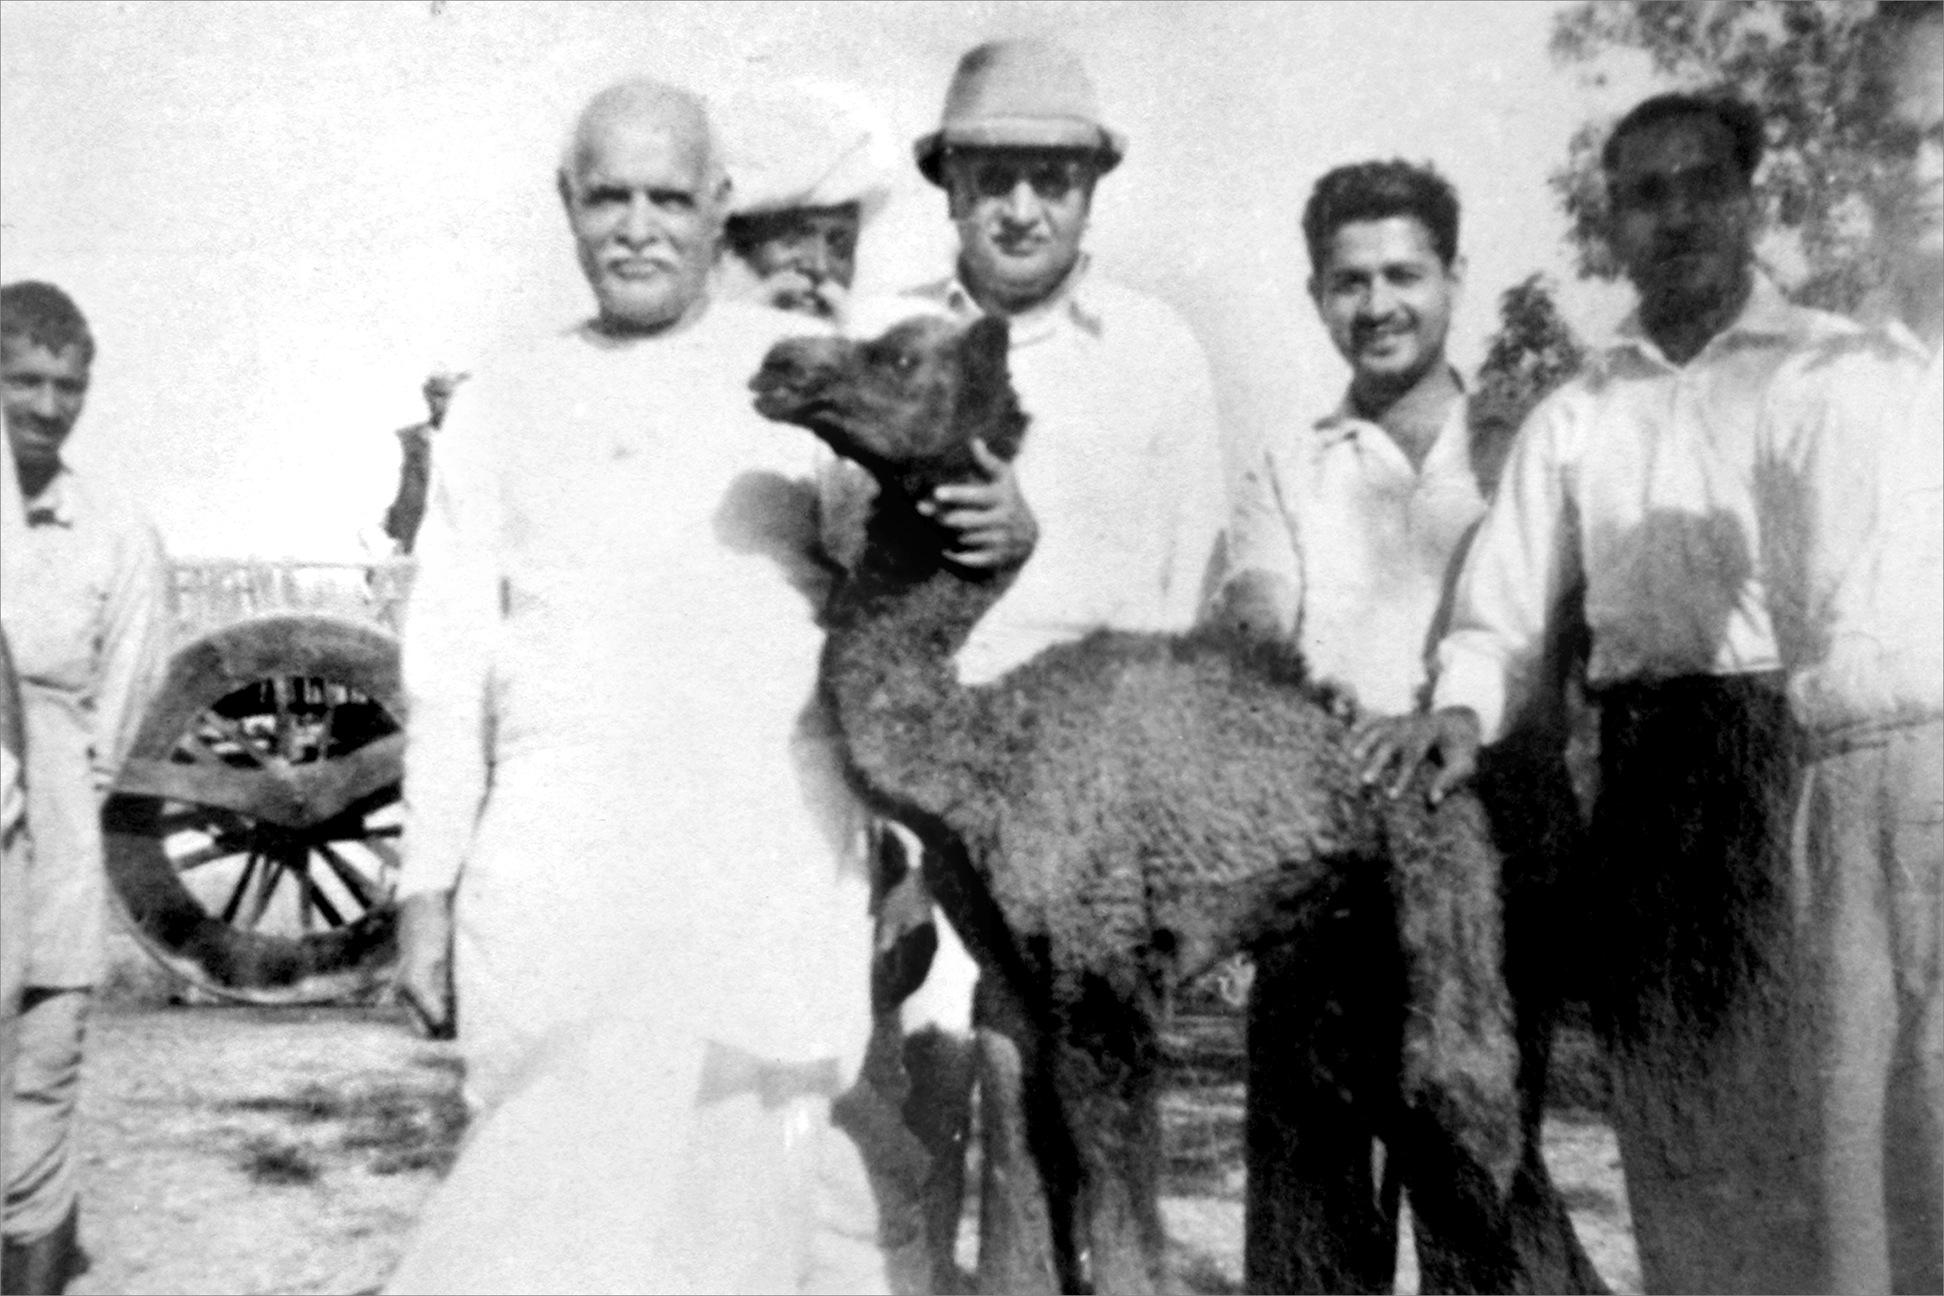 Photo Credit: karachi or hyderabad, c1945